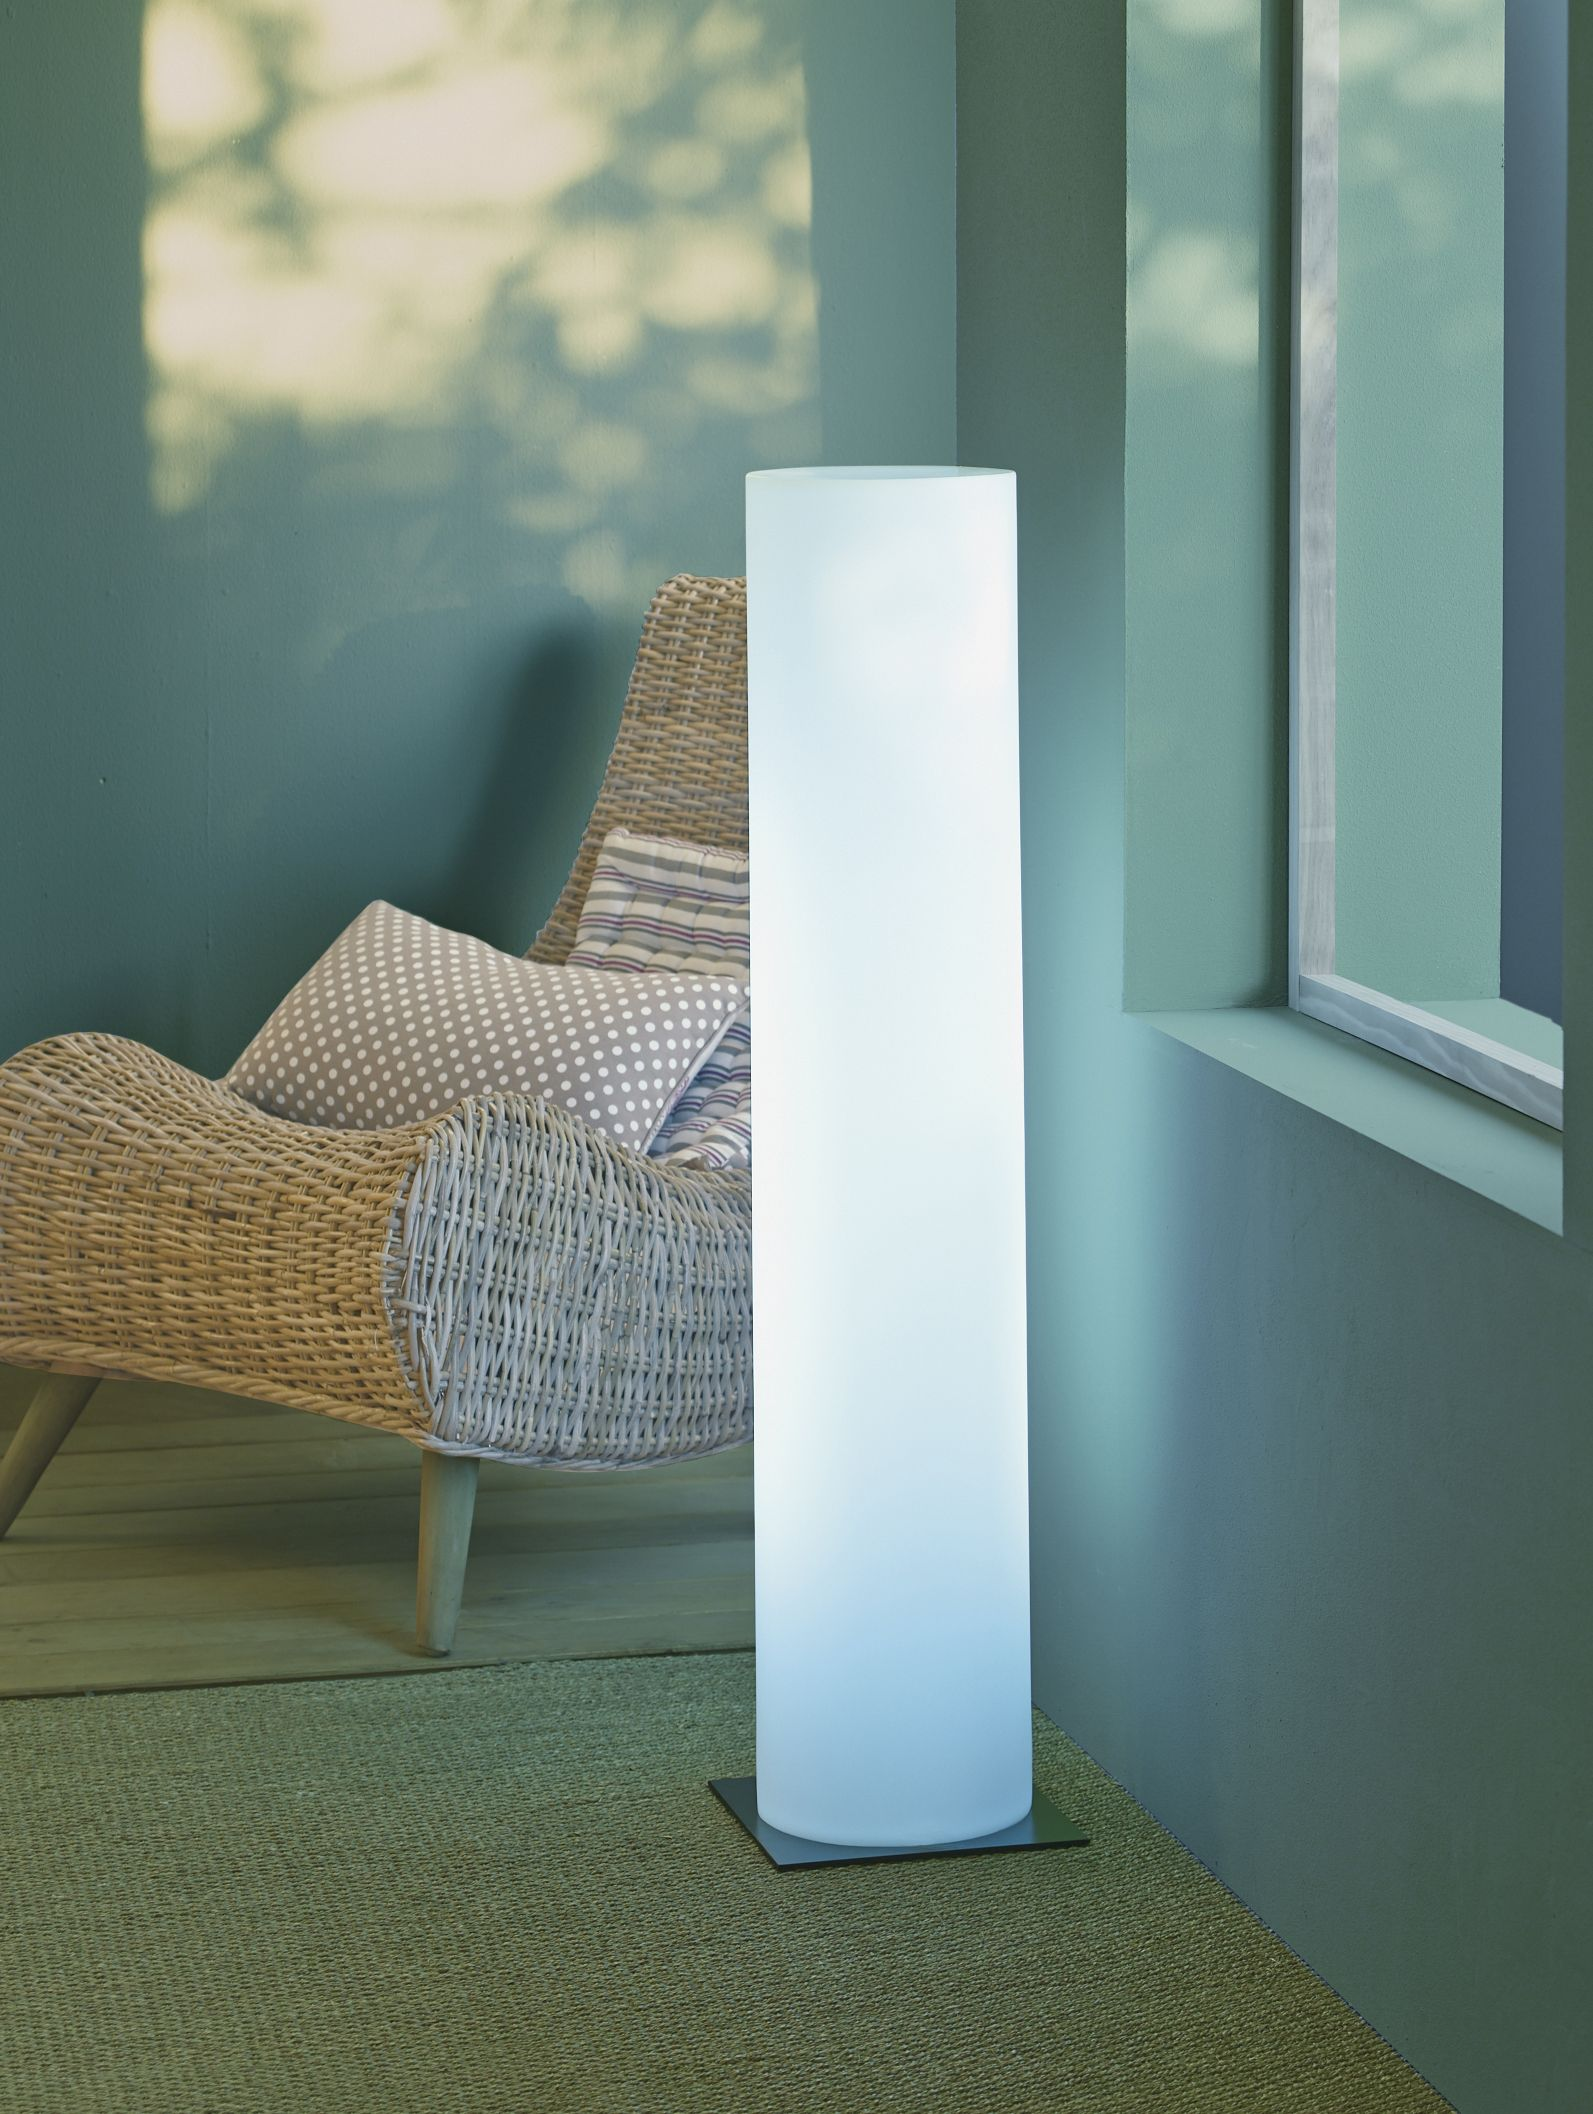 colonna colonne lumineuse alin a luminaires pinterest alin a luminaires et ronflement. Black Bedroom Furniture Sets. Home Design Ideas